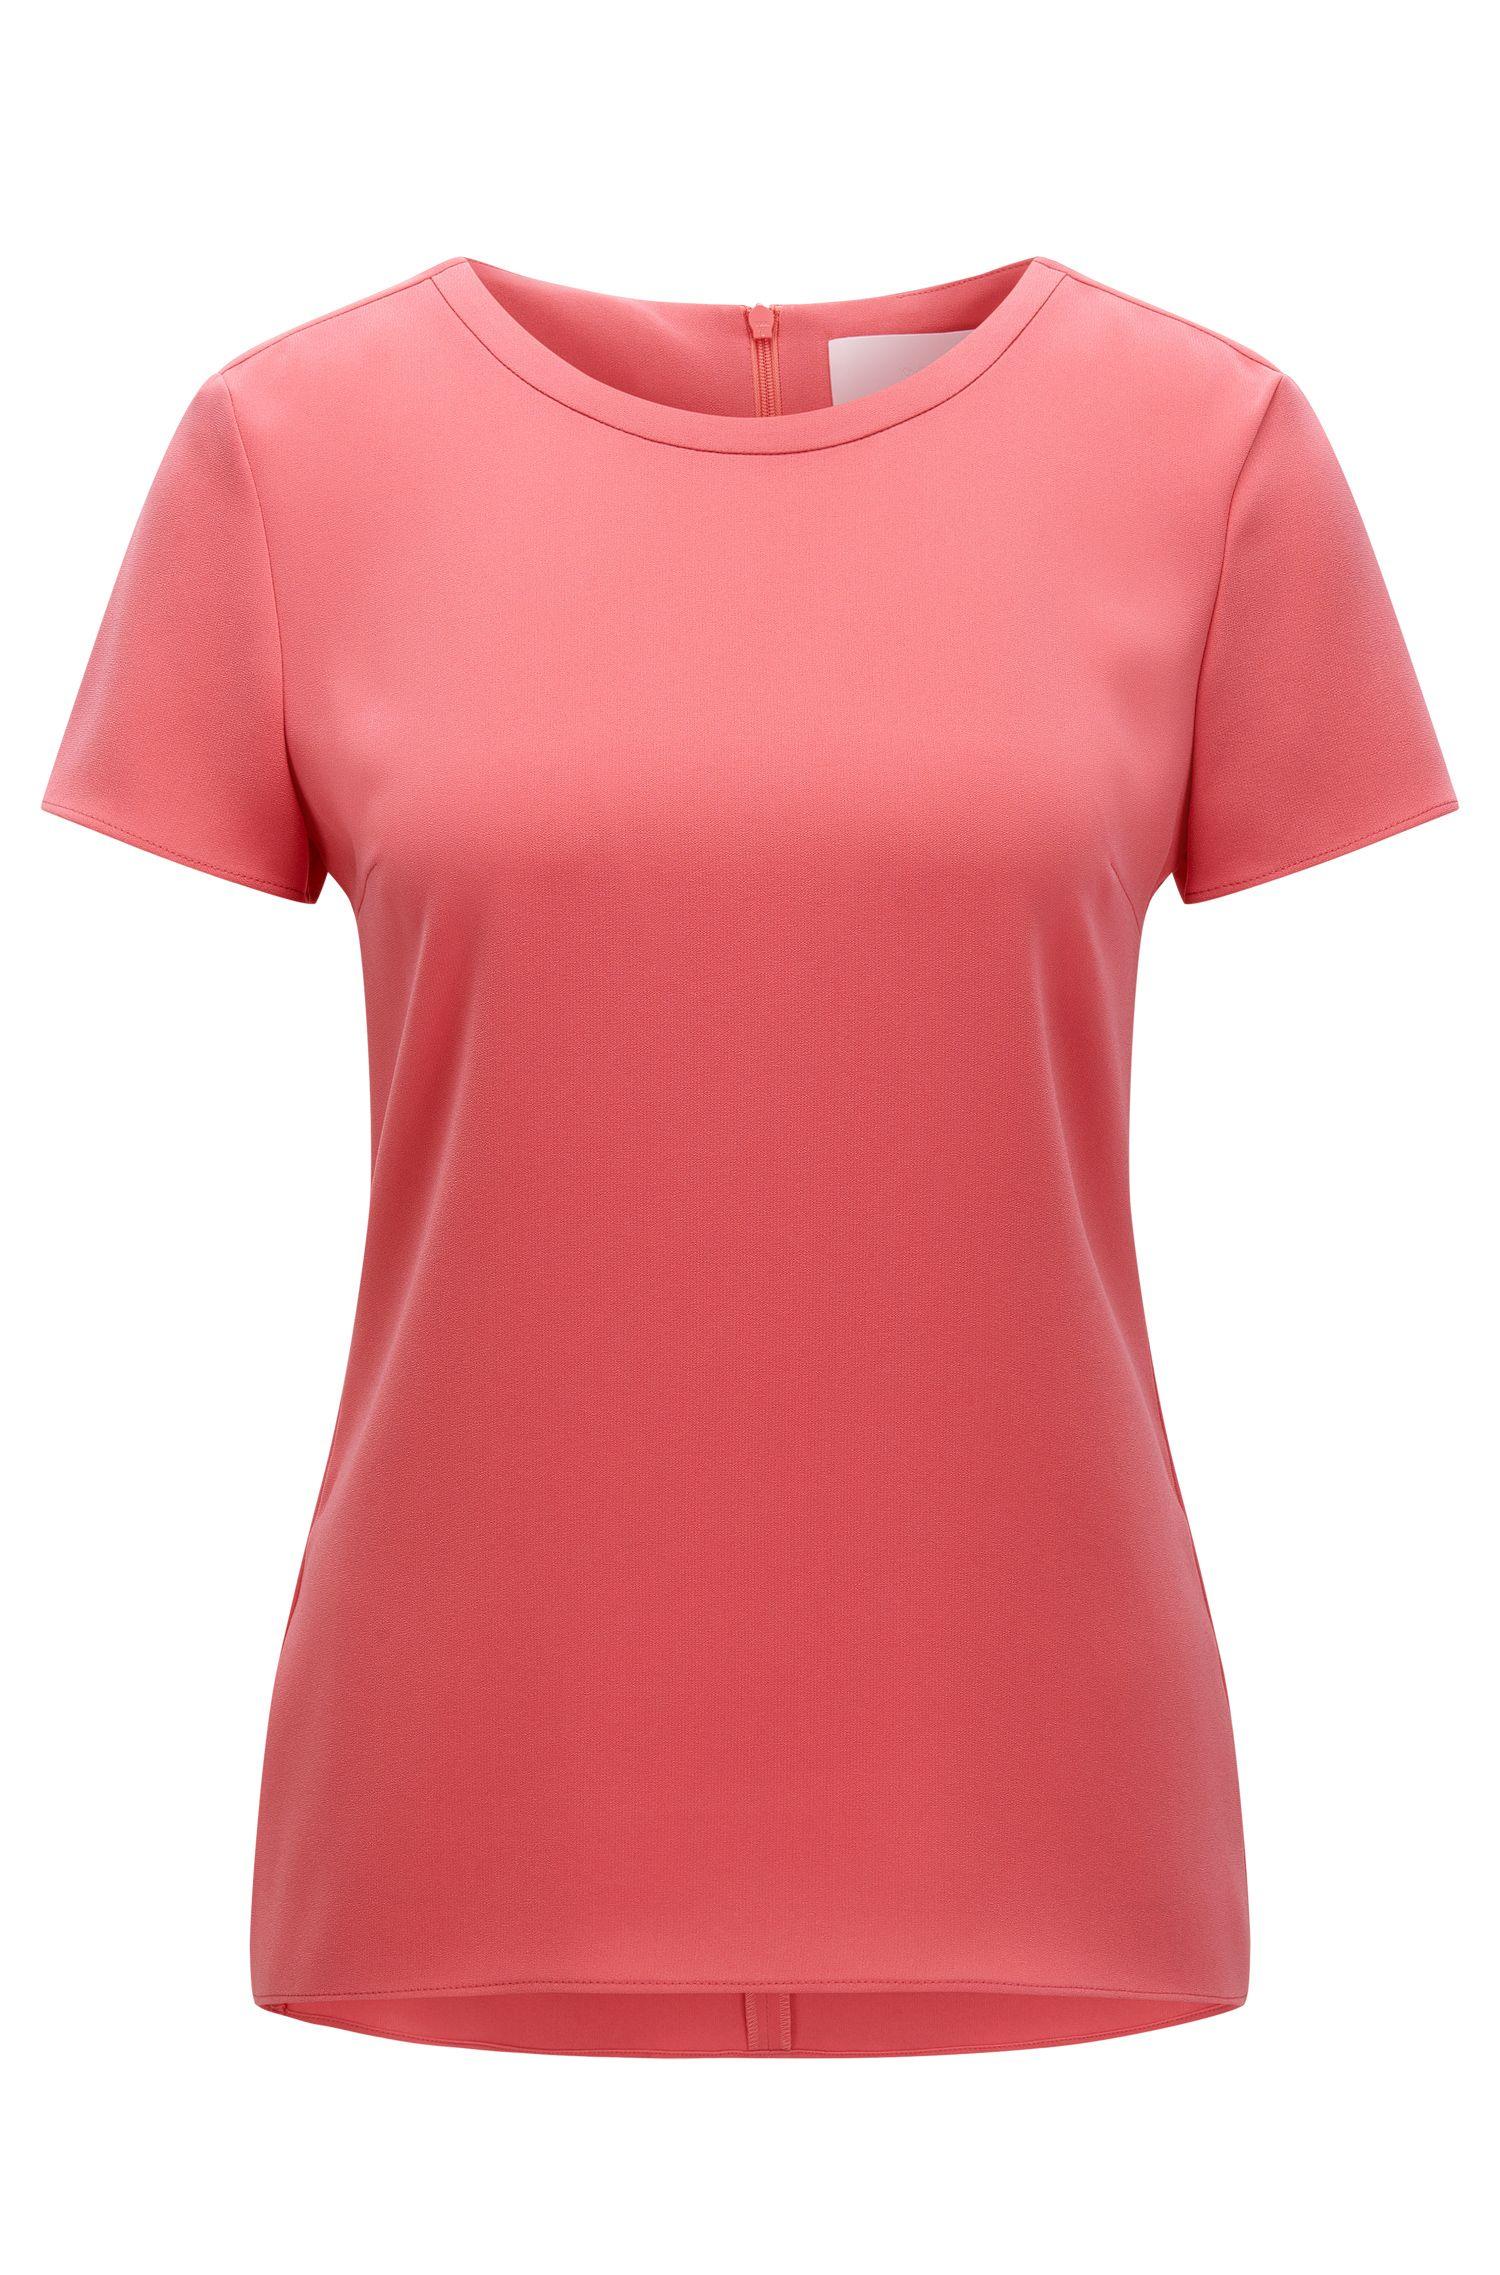 'Ilyna' | Crepe Short Sleeved Blouse